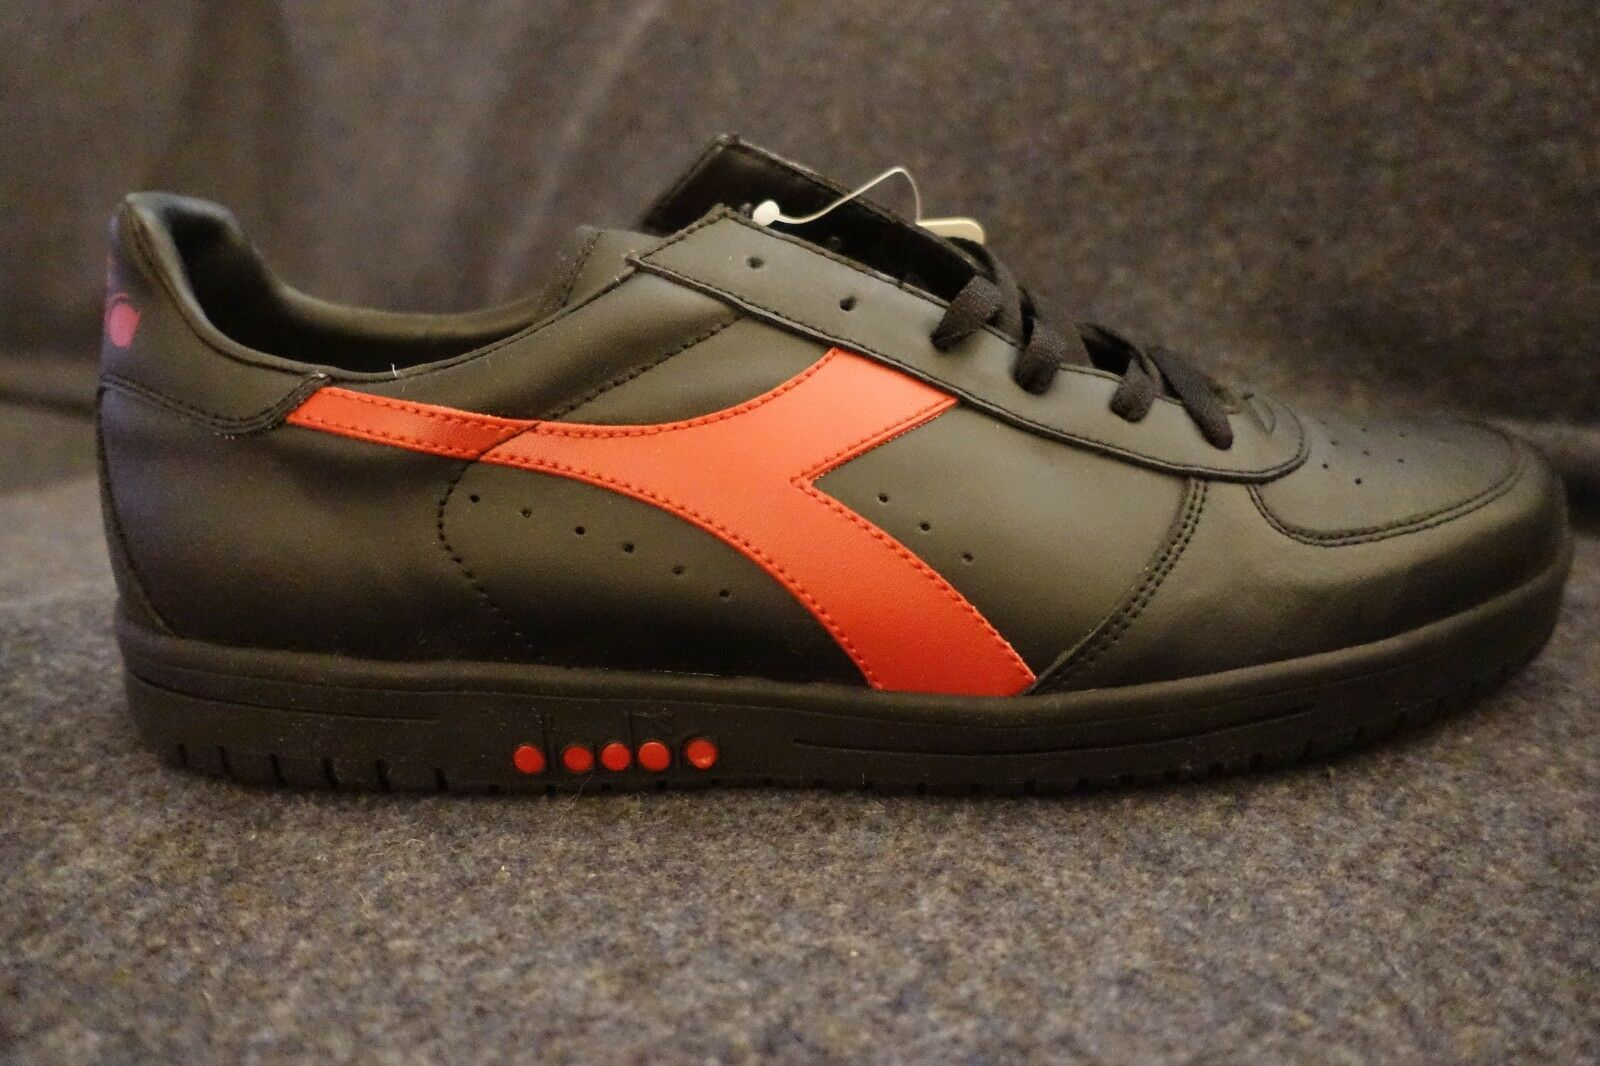 Mens Black Red 13 Diadora Delta Shoes New Box NOS PERFECT RARE Not produced!